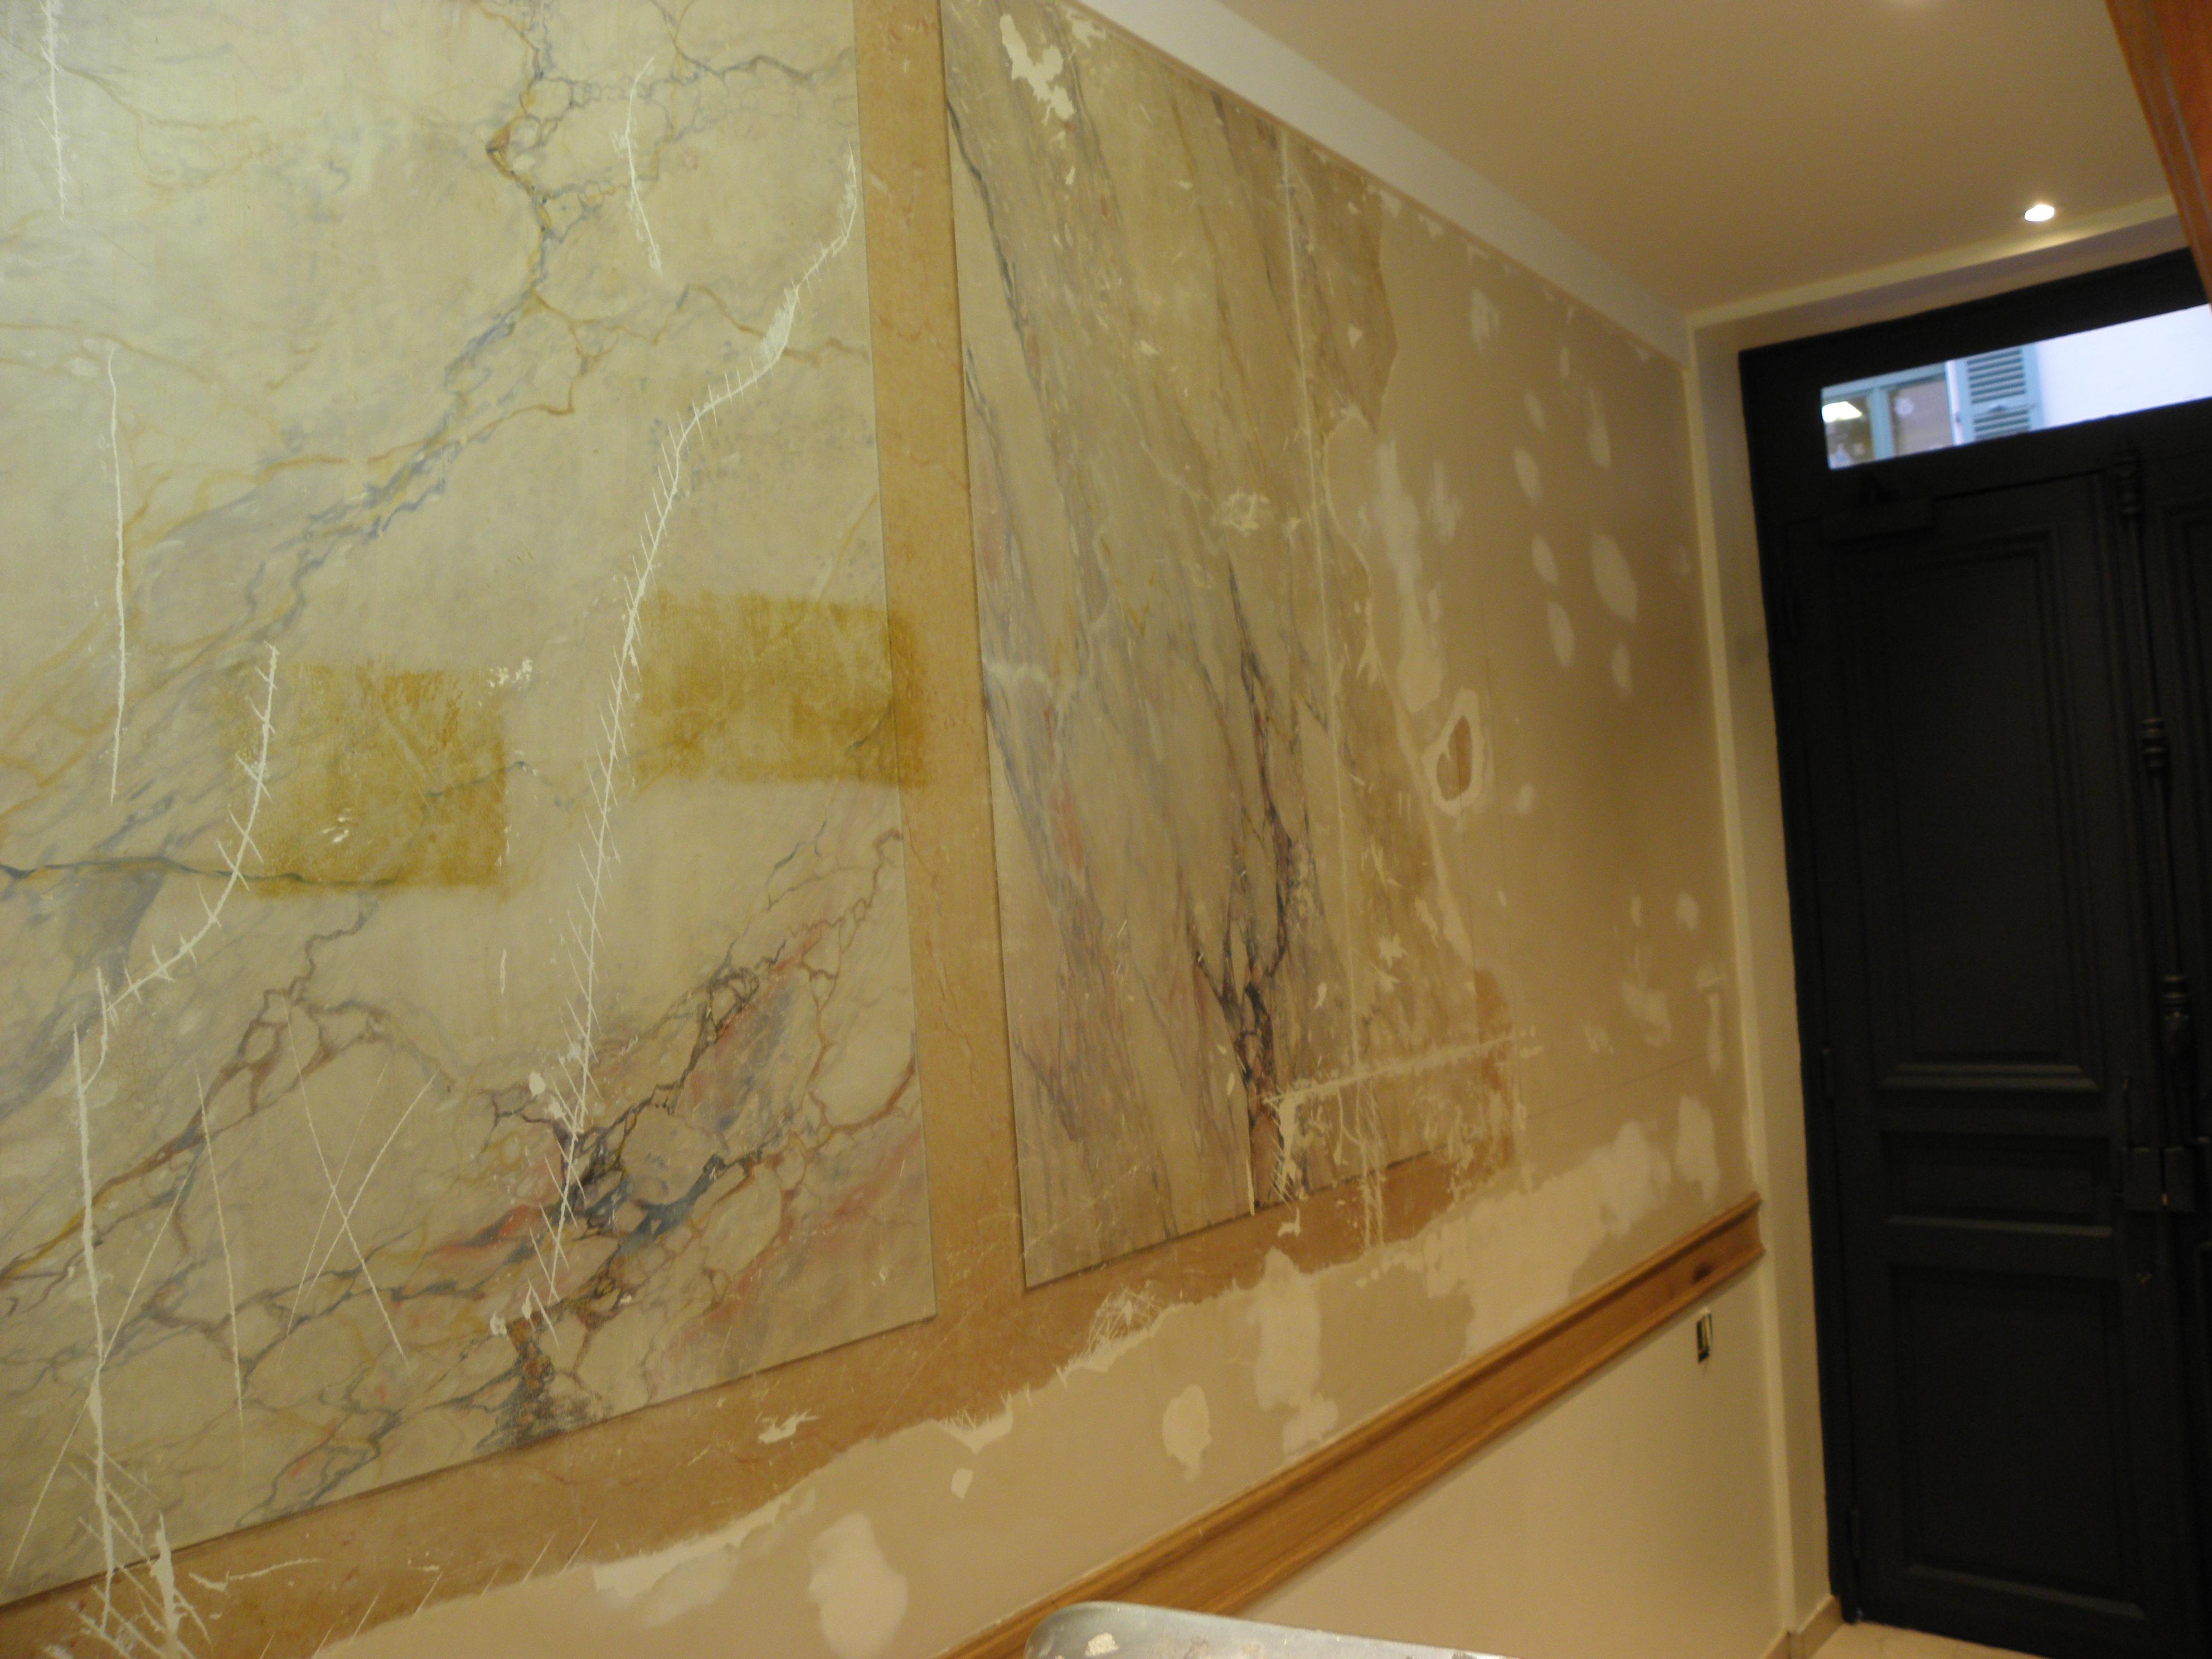 Best peinture stucco marbre contemporary transformatorio for Peinture murale stucco